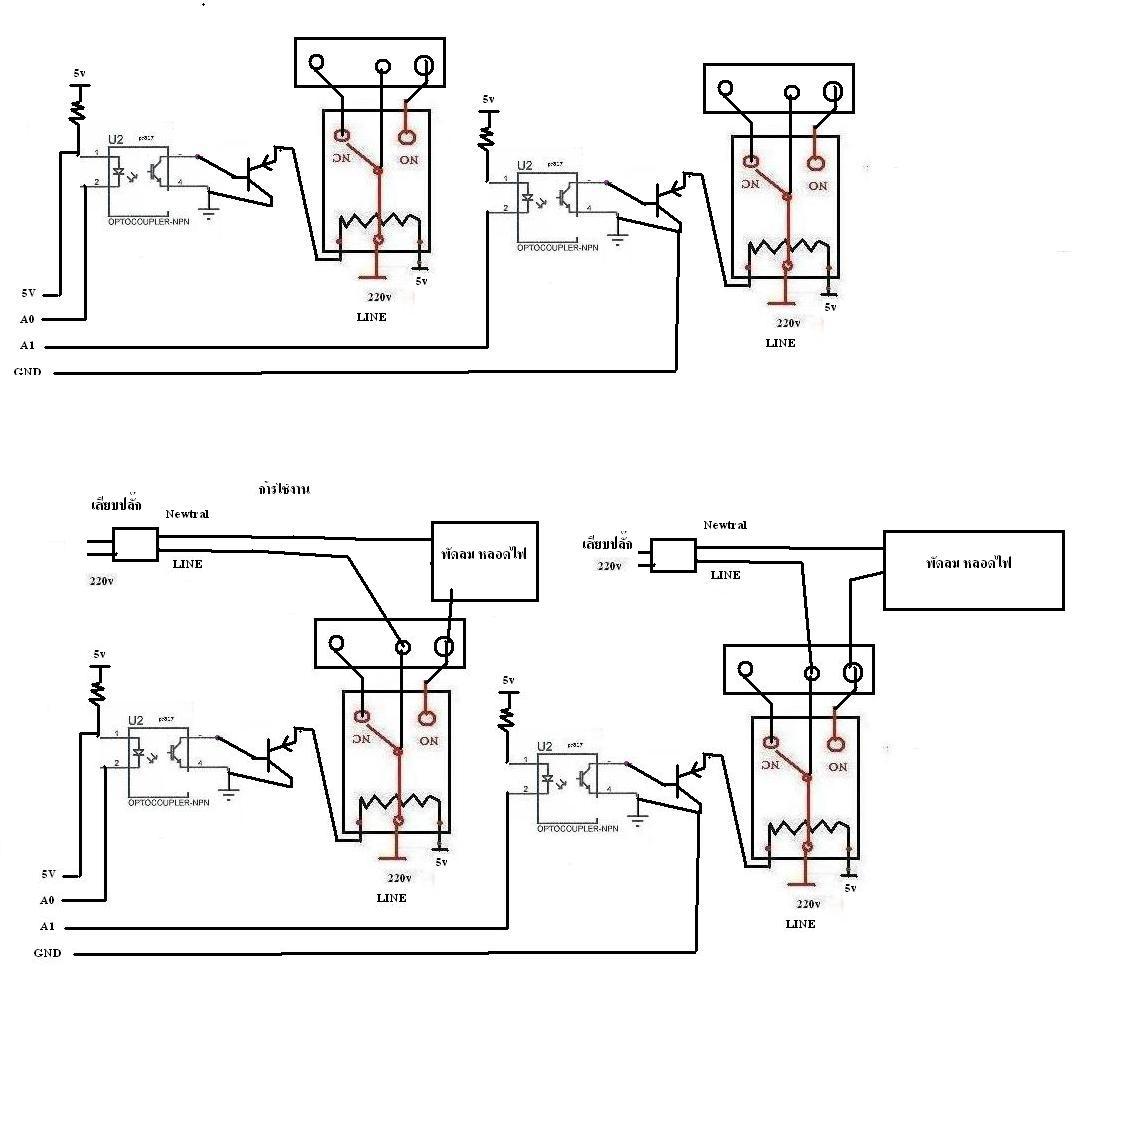 module relay 12v 30a  u0e21 u0e35 opto  u0e44 u0e21 u0e48 u0e15 u0e49 u0e2d u0e07 u0e01 u0e25 u0e31 u0e27 u0e27 u0e48 u0e32 mcu  u0e08 u0e30 u0e1e u0e31 u0e07